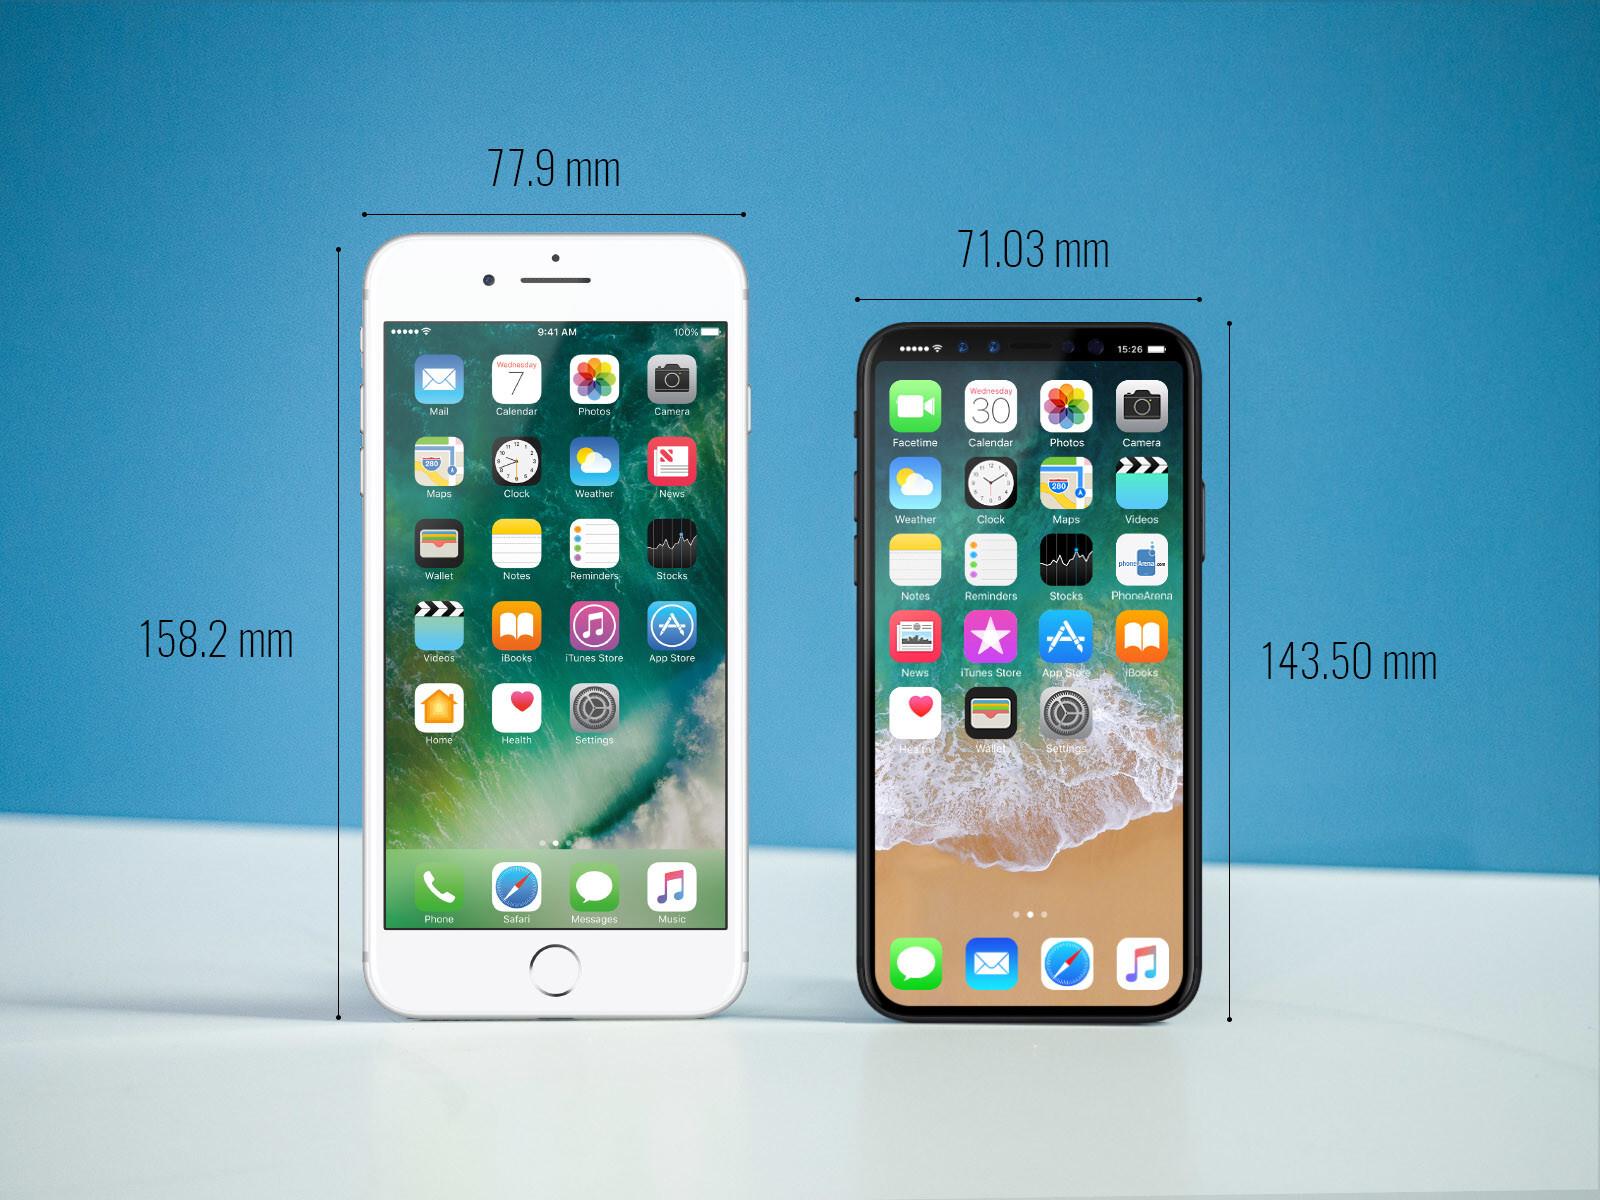 iPhone 8 dimensions and size comparison vs iPhone 7 ... Iphone 5 6 7 Size Comparison